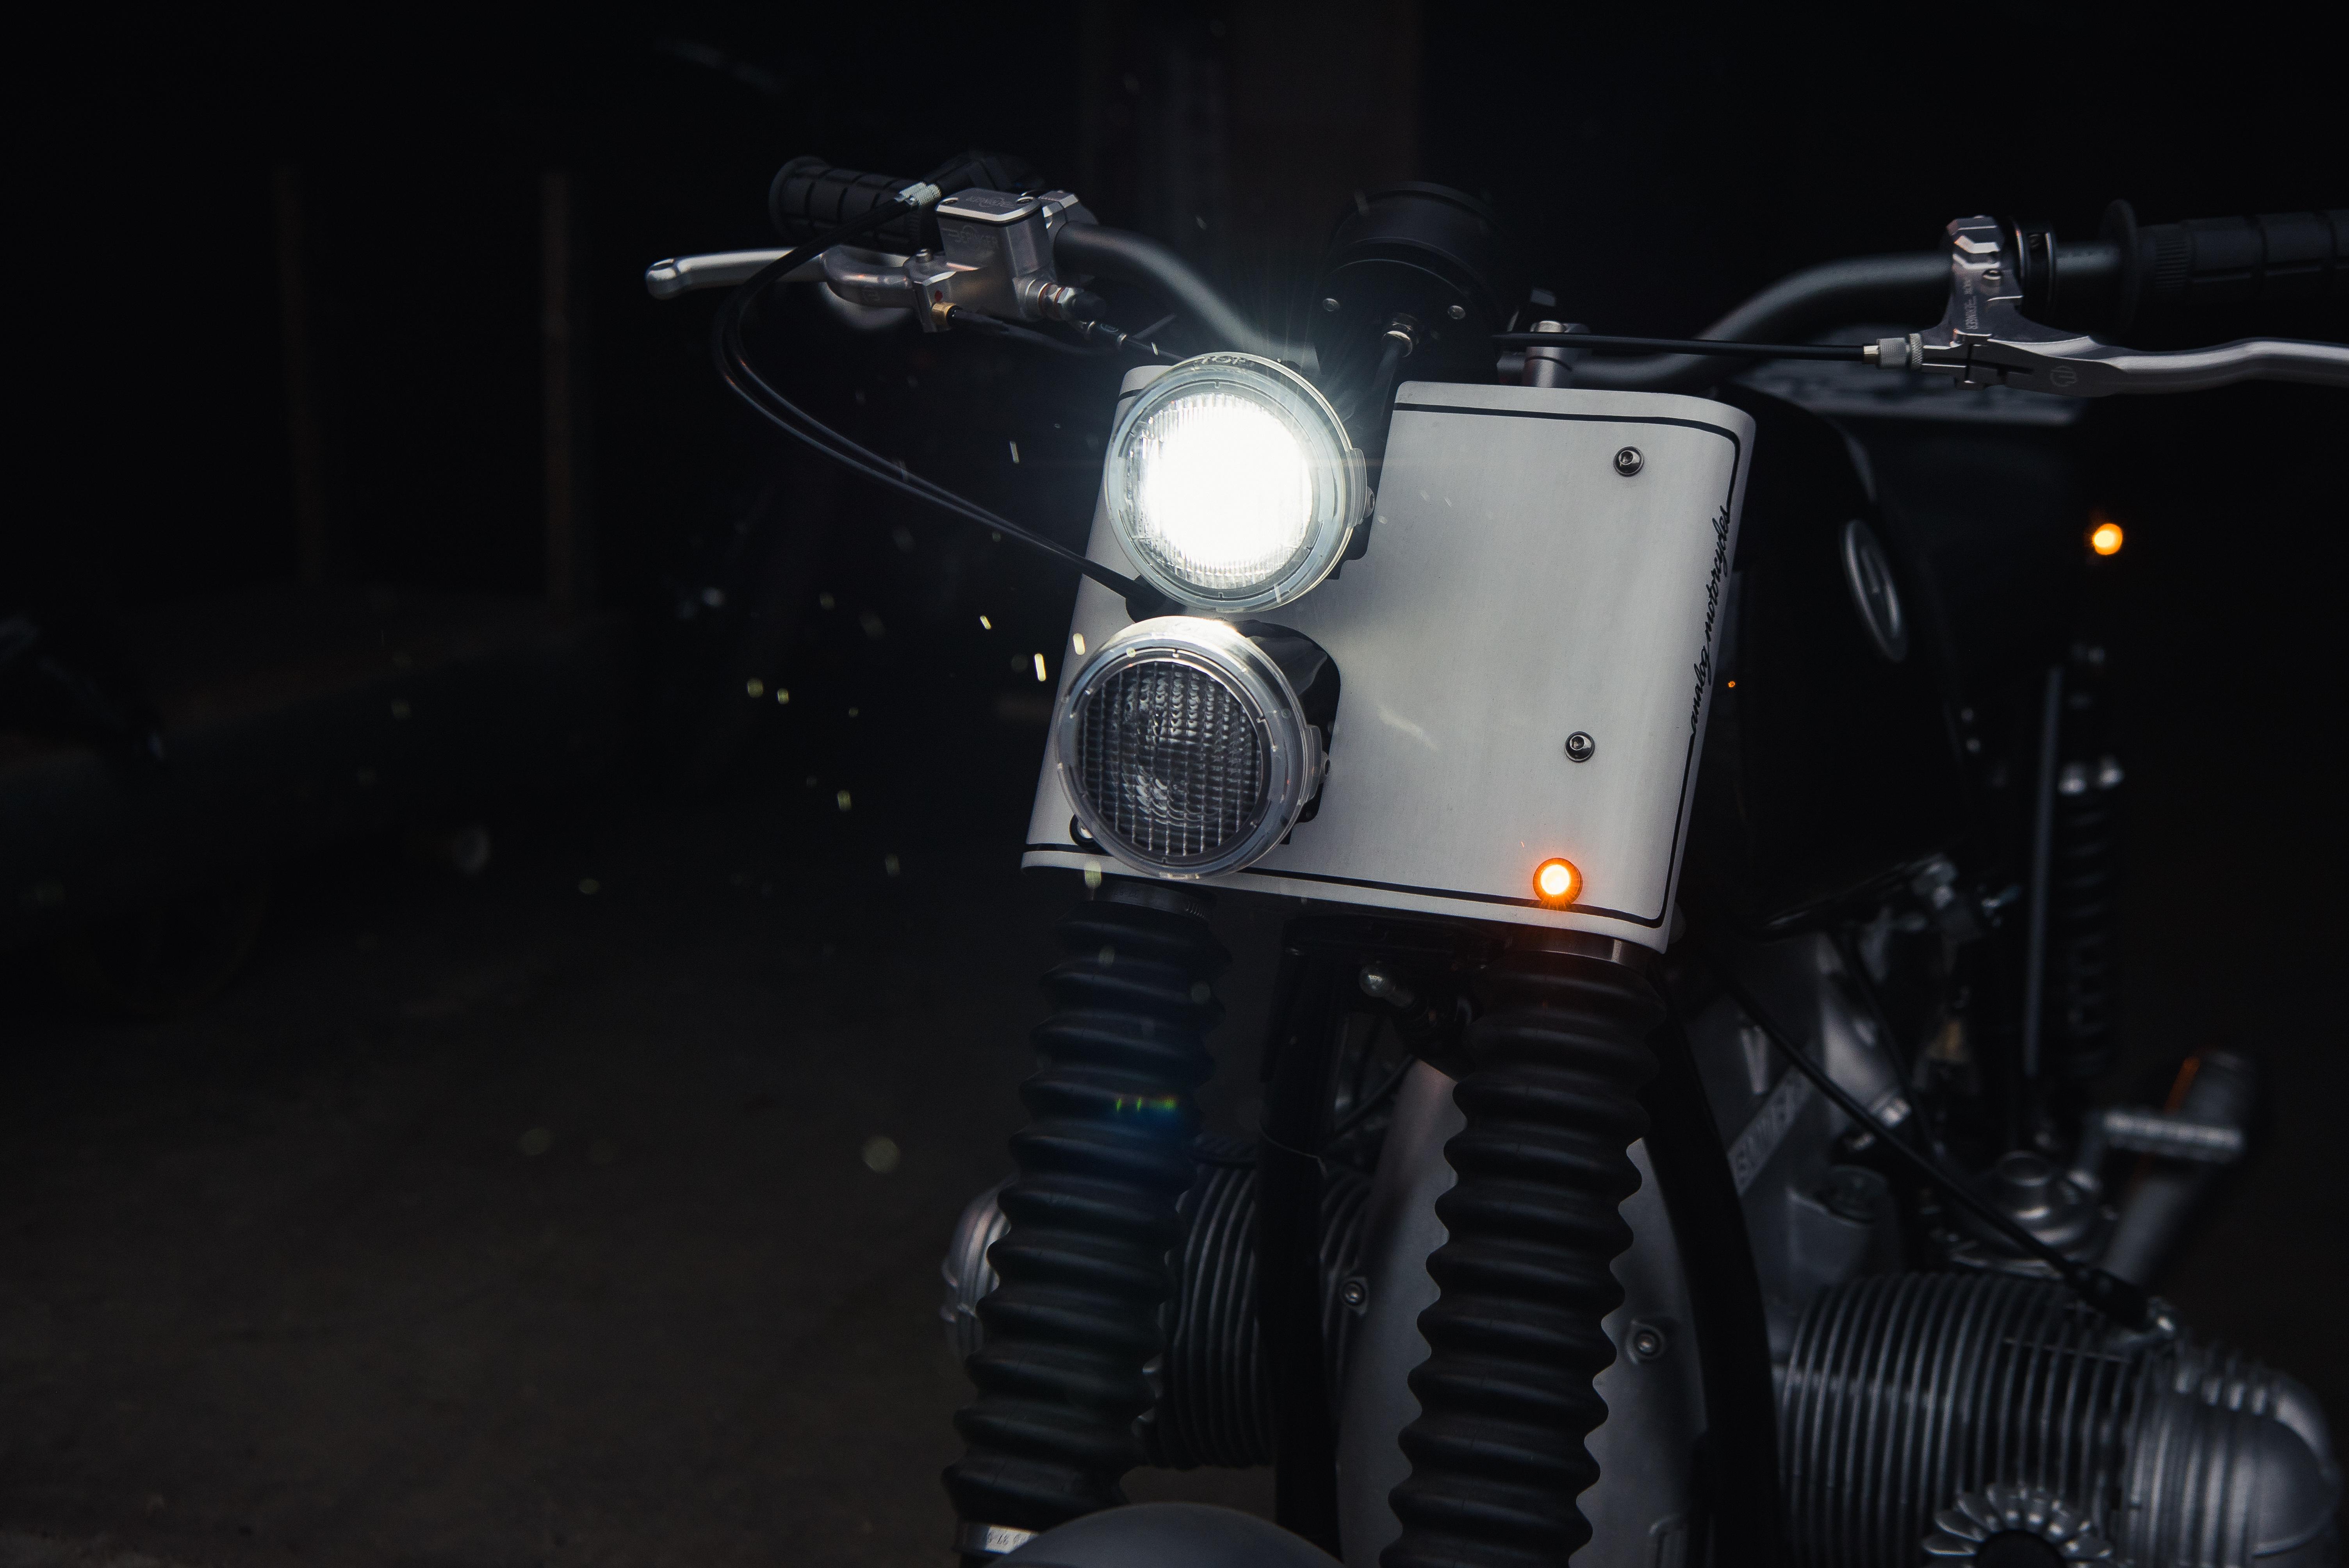 halogenspot lightsauxiliary motorcycle decor spot givi trekker lights fog auxiliary halogen